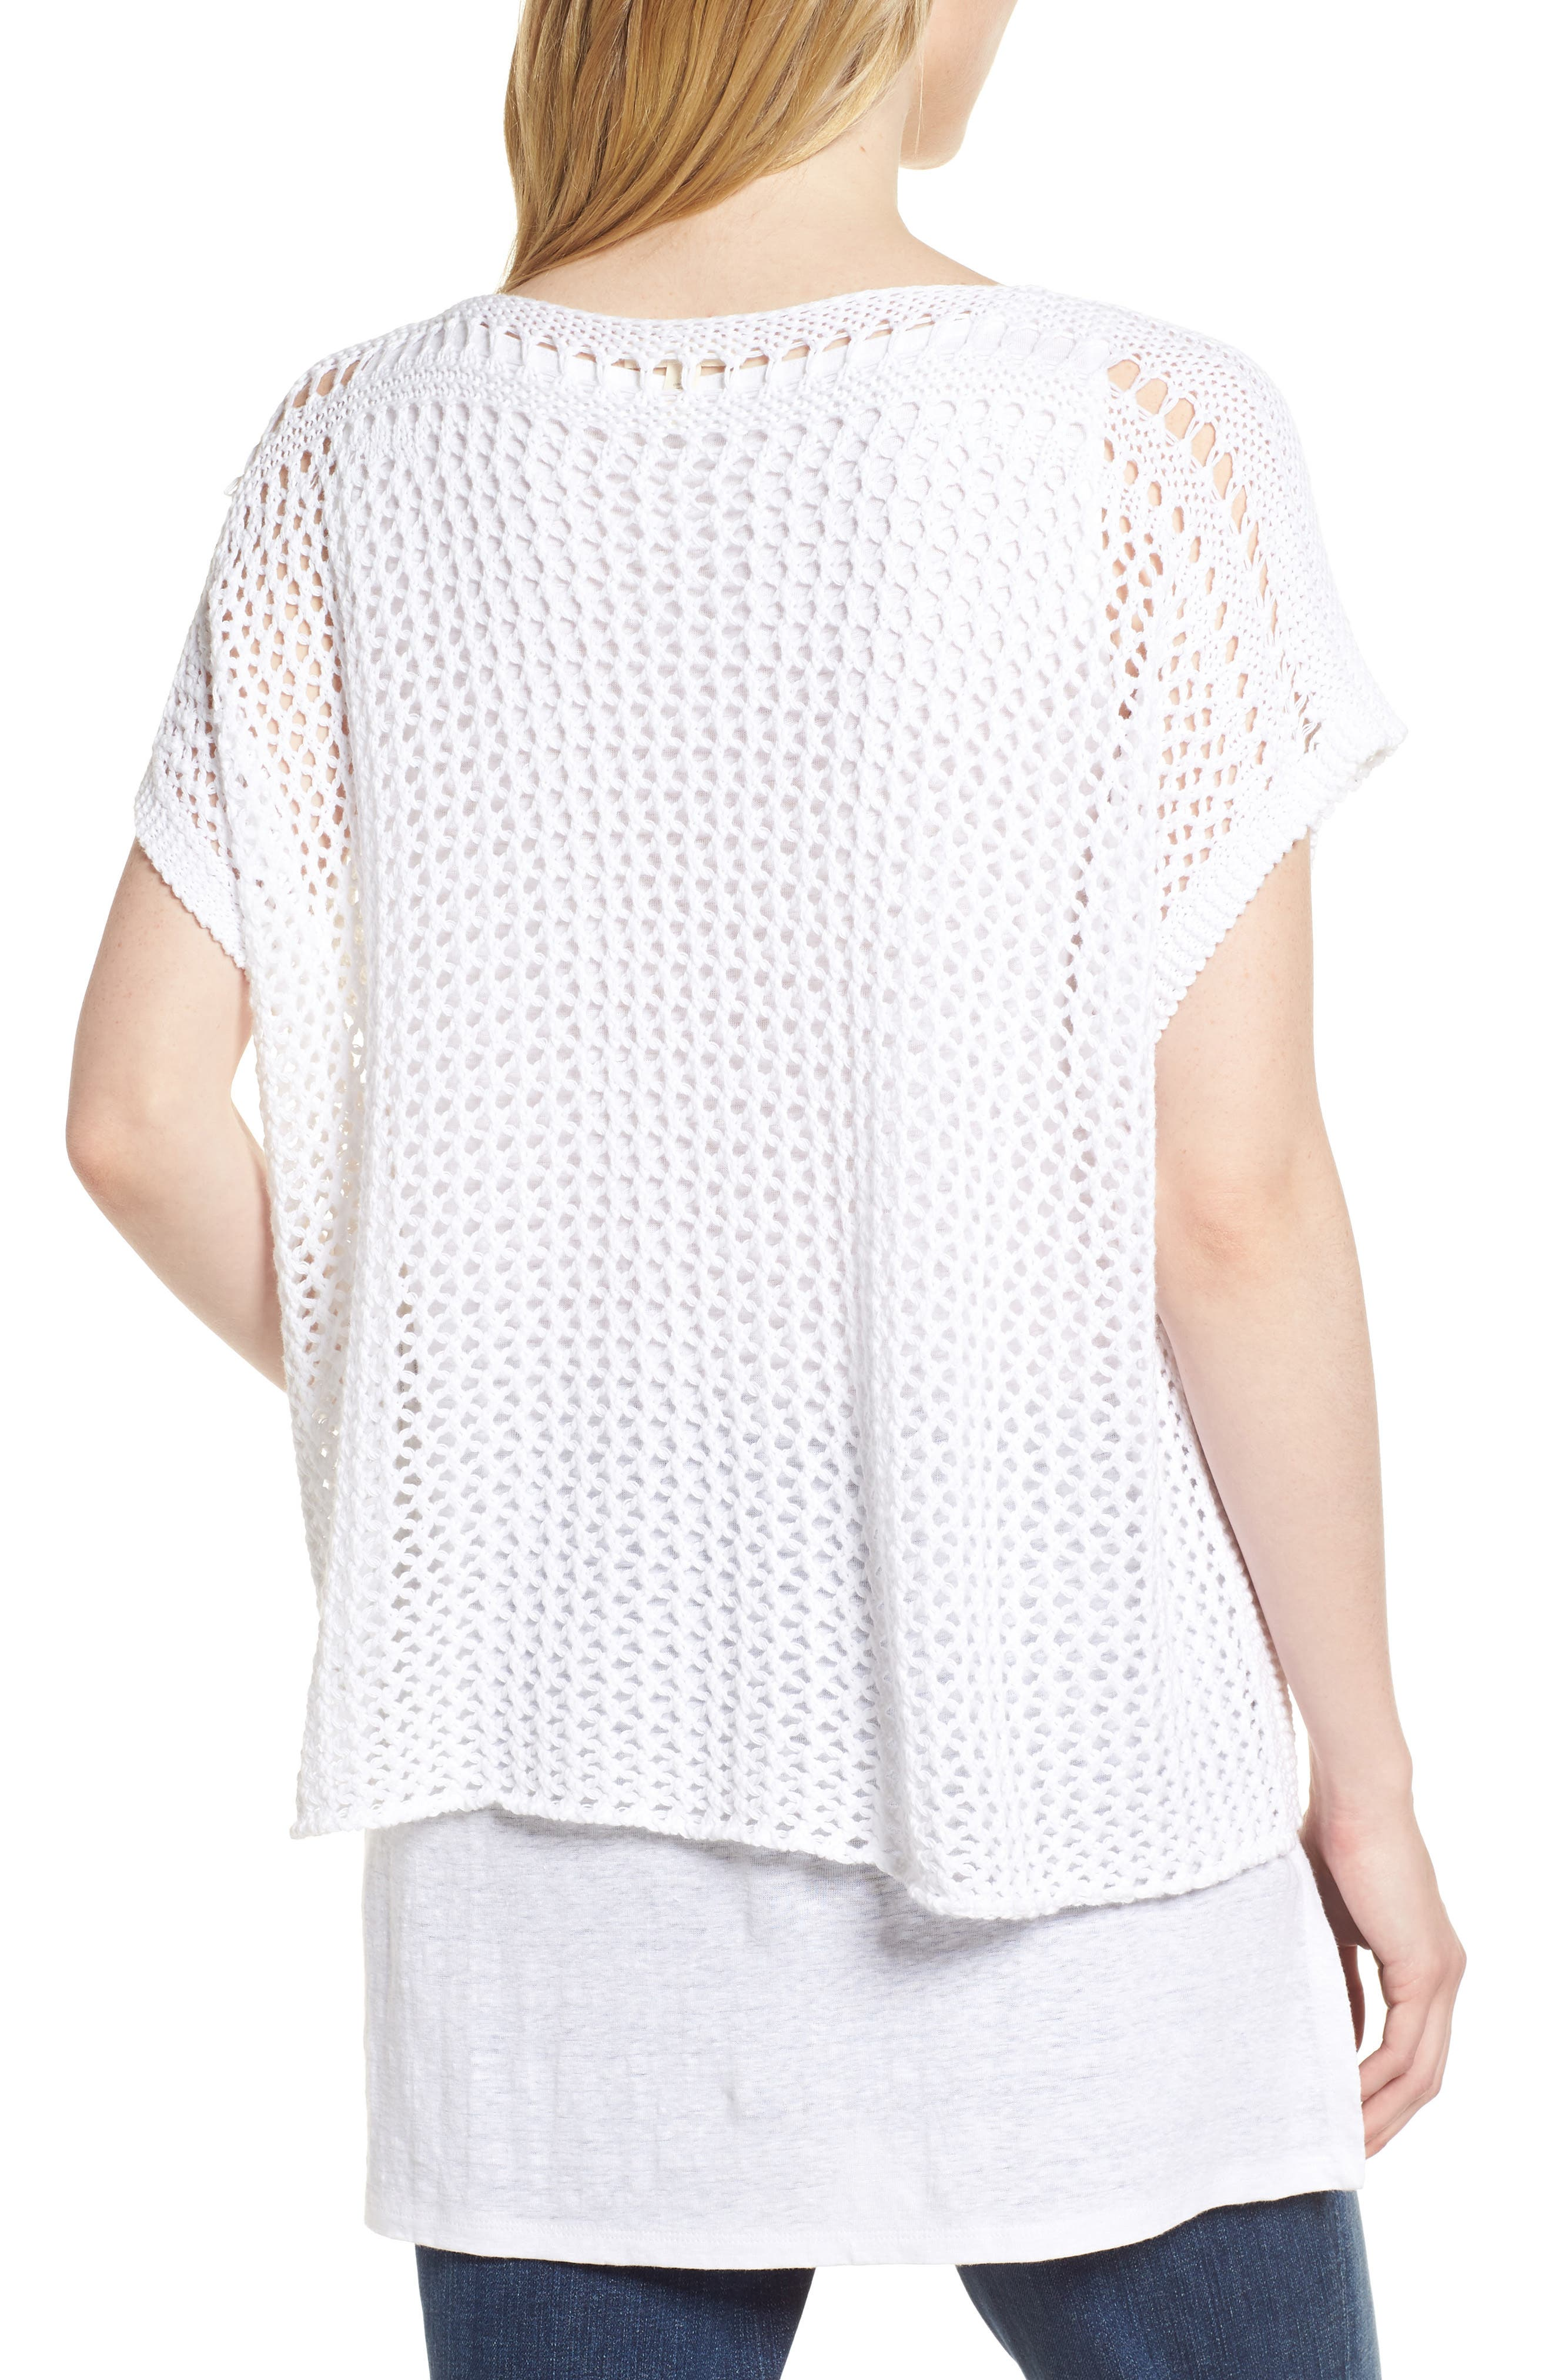 Organic Cotton Sweater,                             Alternate thumbnail 2, color,                             White